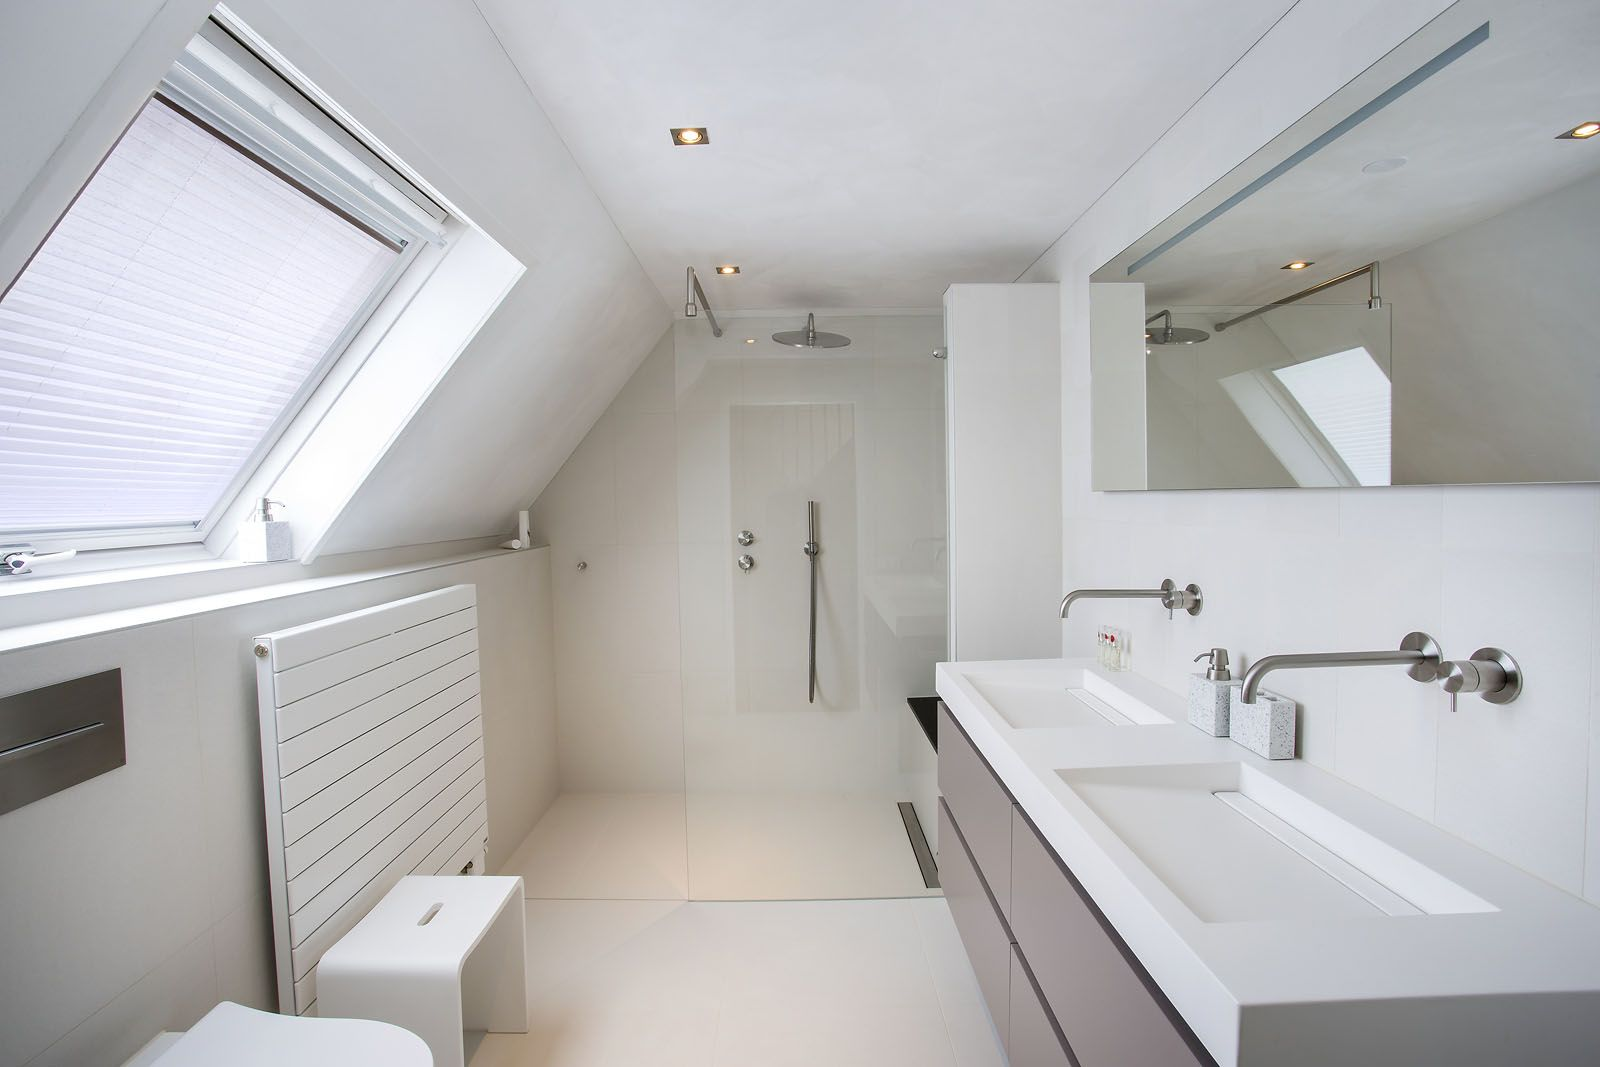 Mooie lichte badkamer onder schuin dak #zolder #badkamer I BALANCE ...